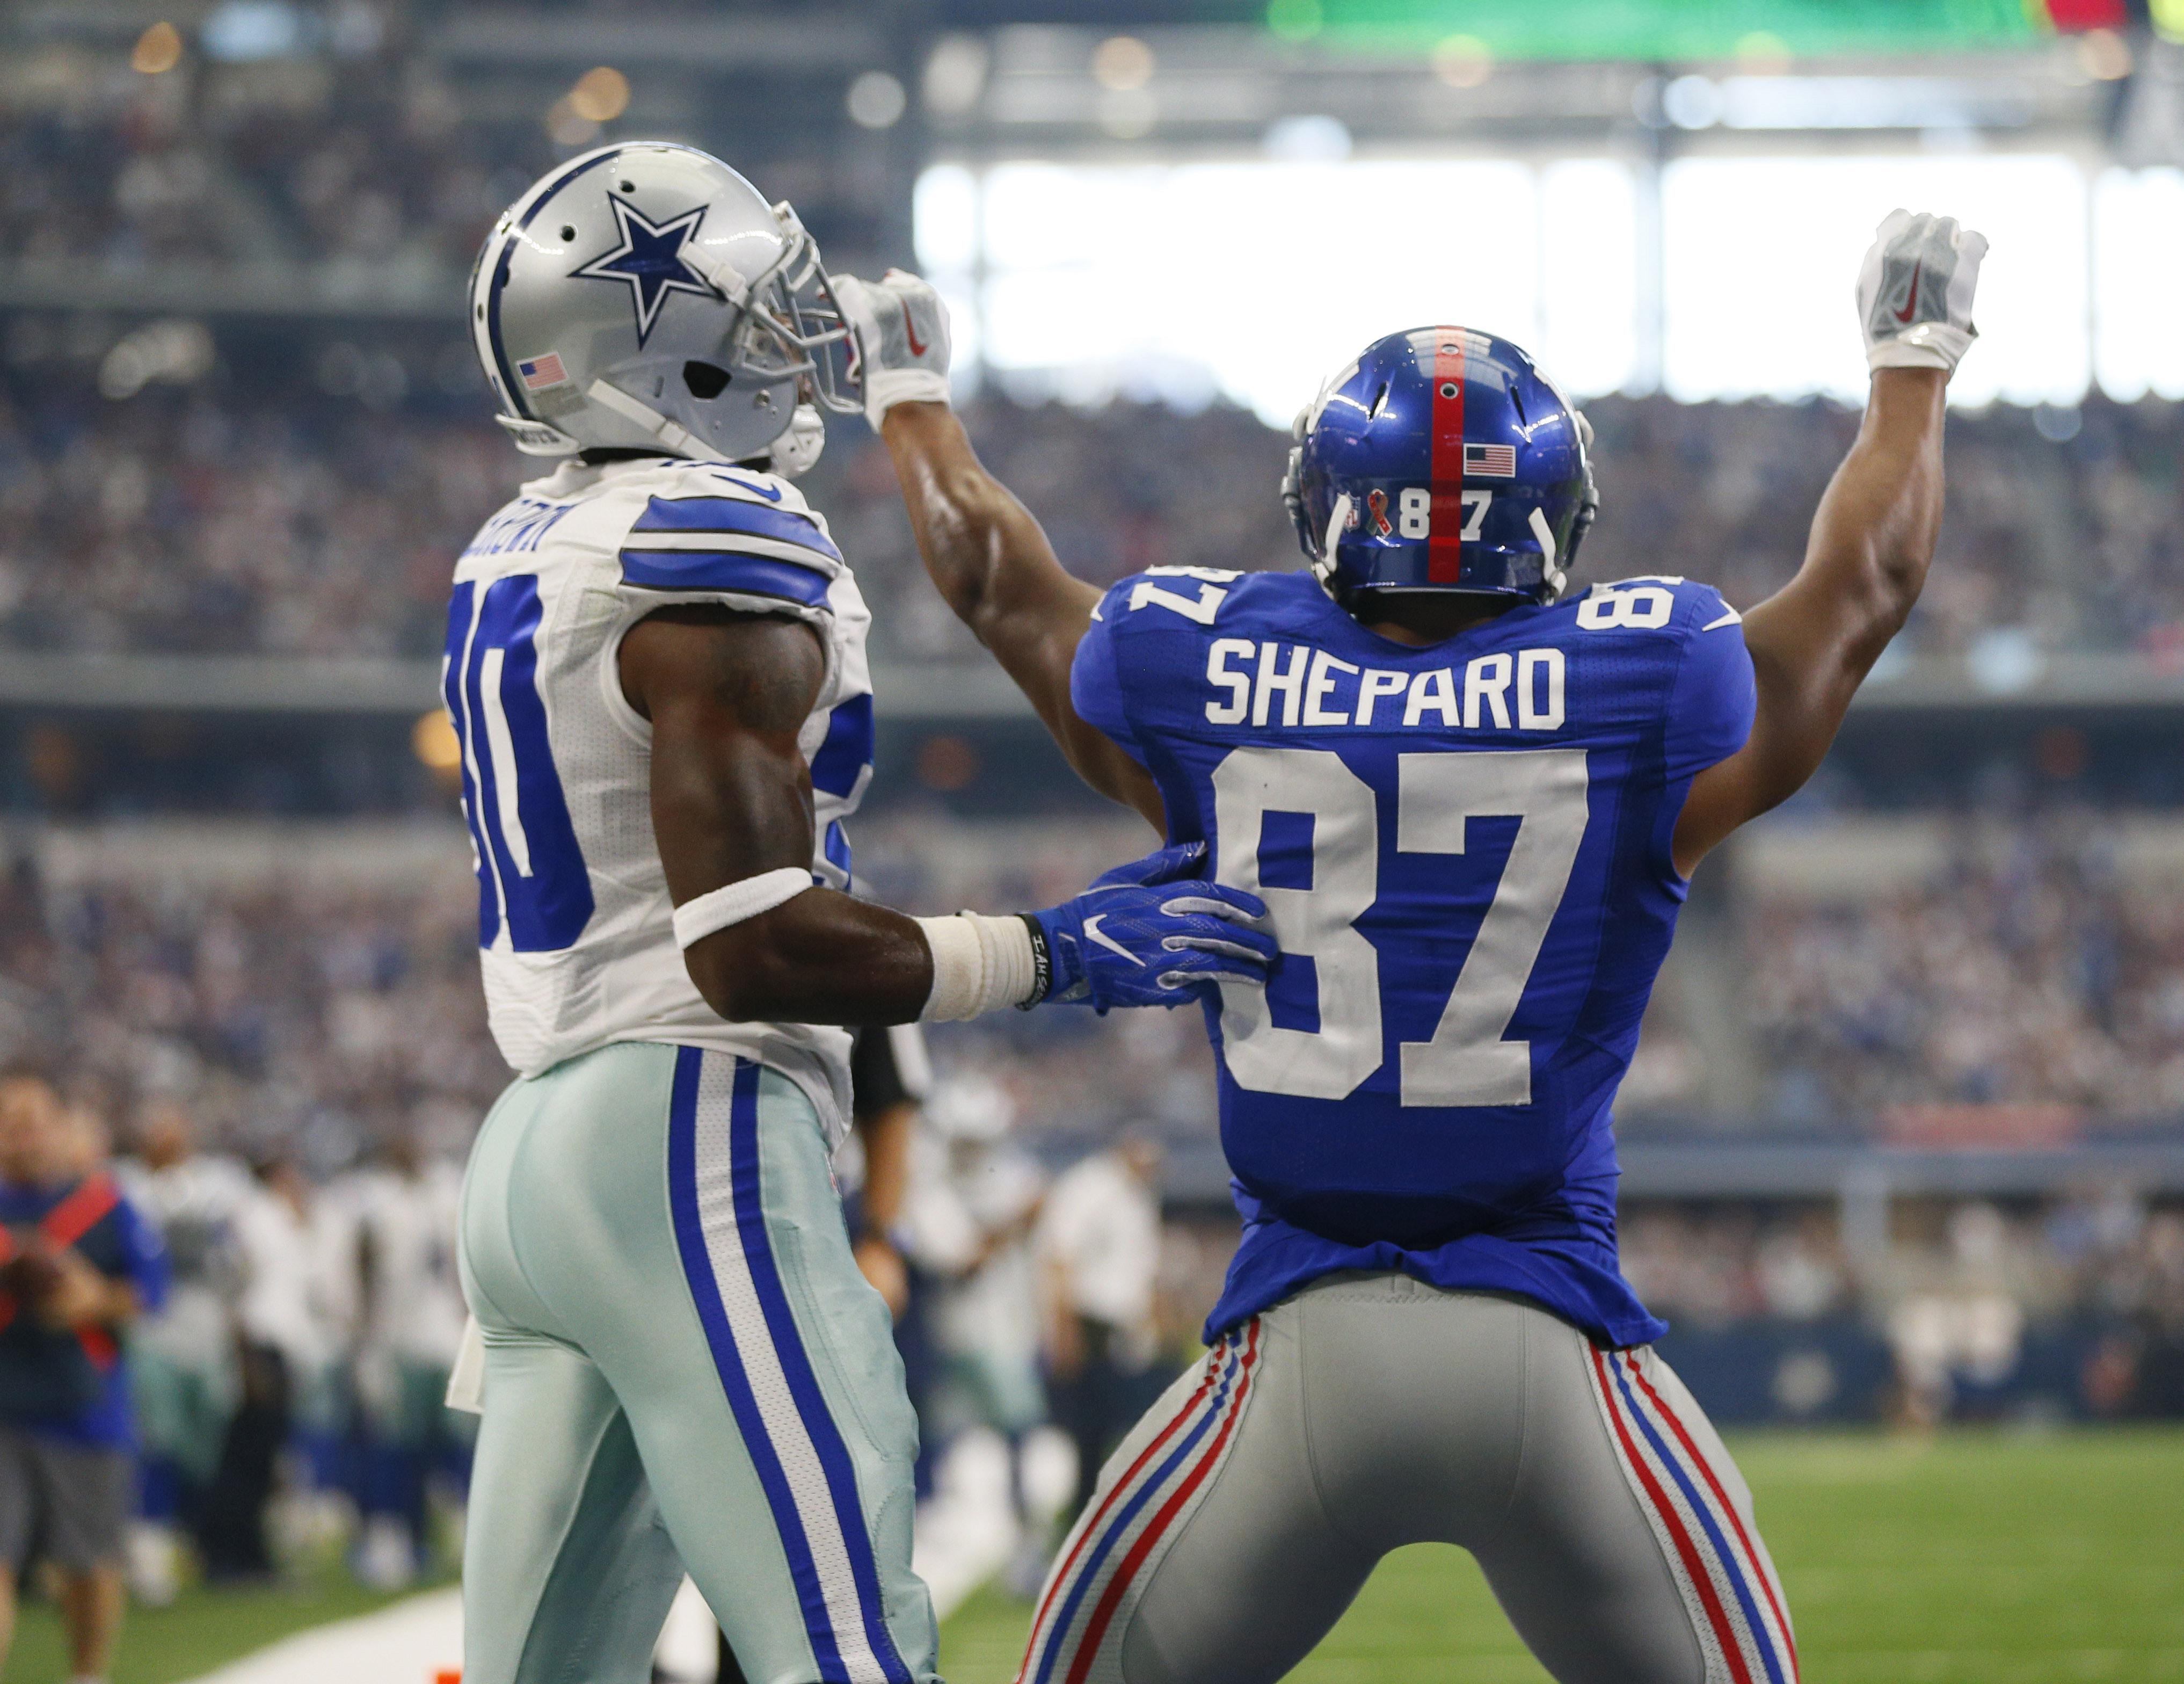 NFL: New York Giants at Dallas Cowboys